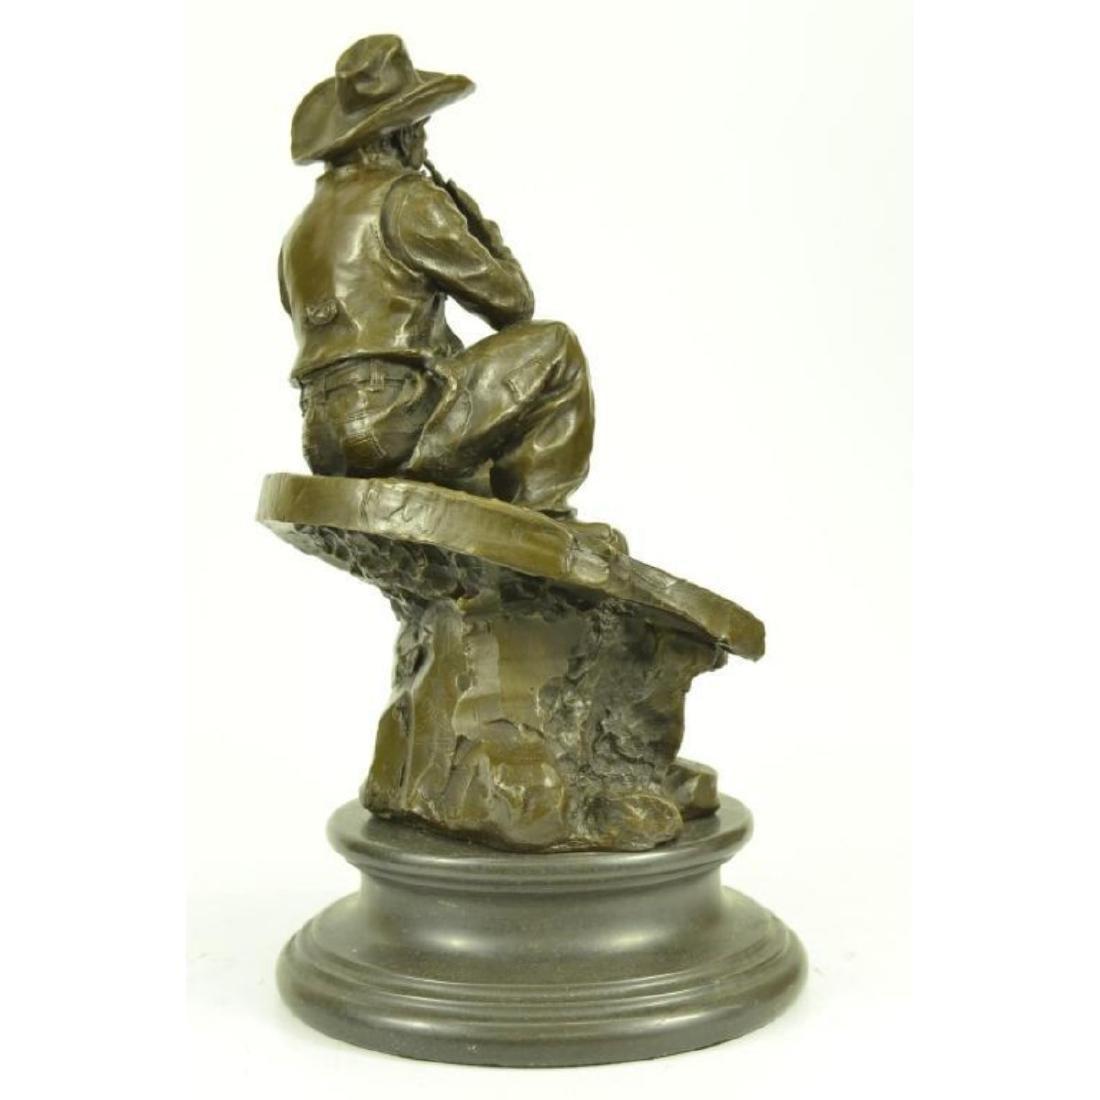 Western Cowboy Bronze Sculpture - 2